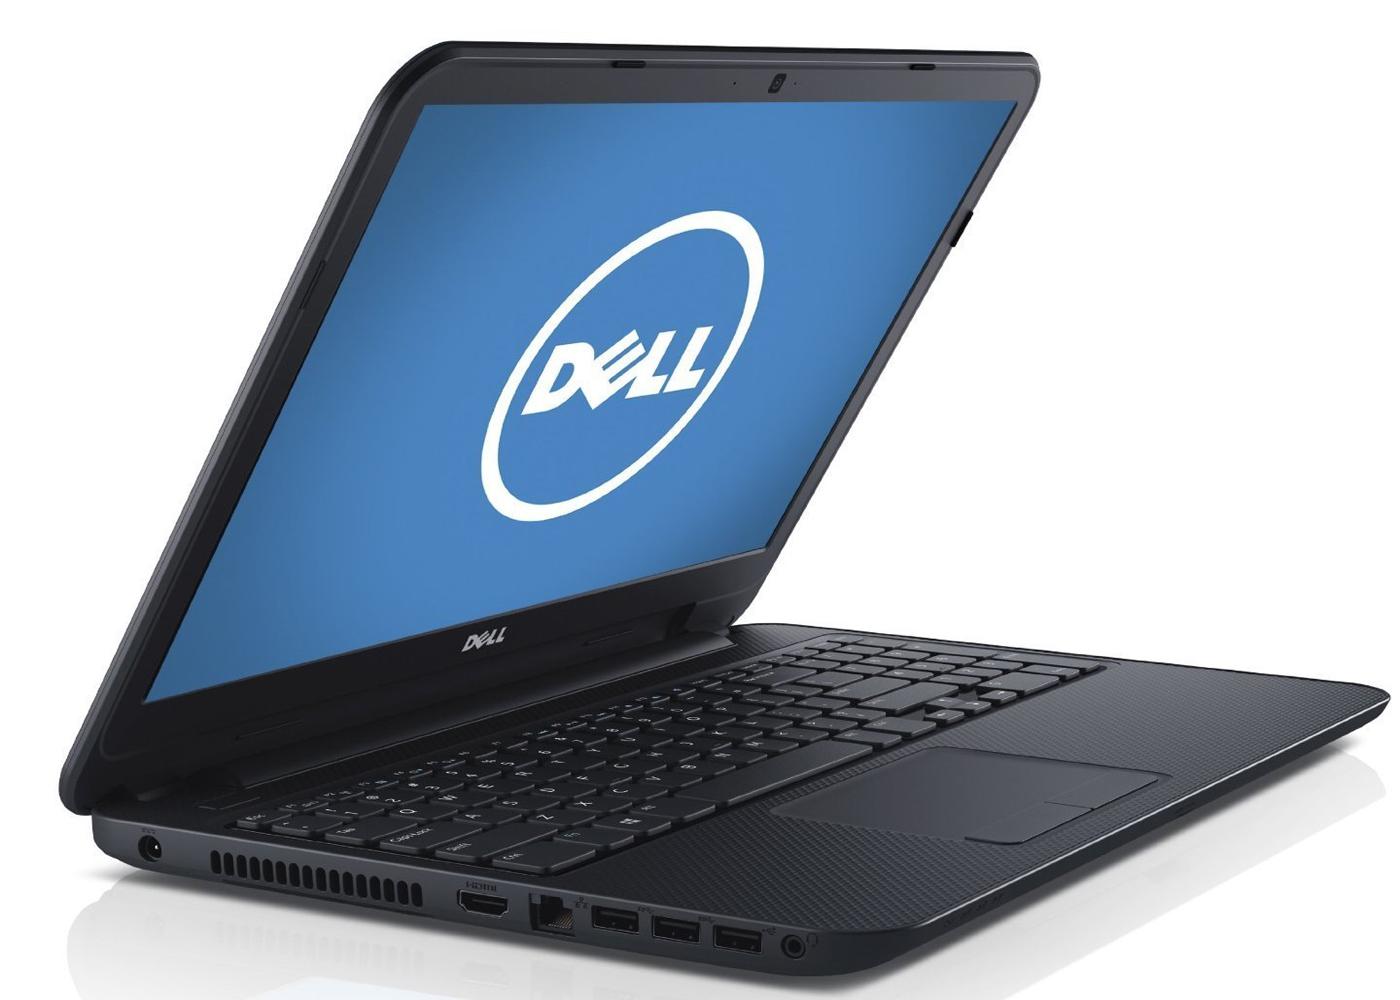 Dell Inspiron 15 3521 15.6-inch Laptop (Black)